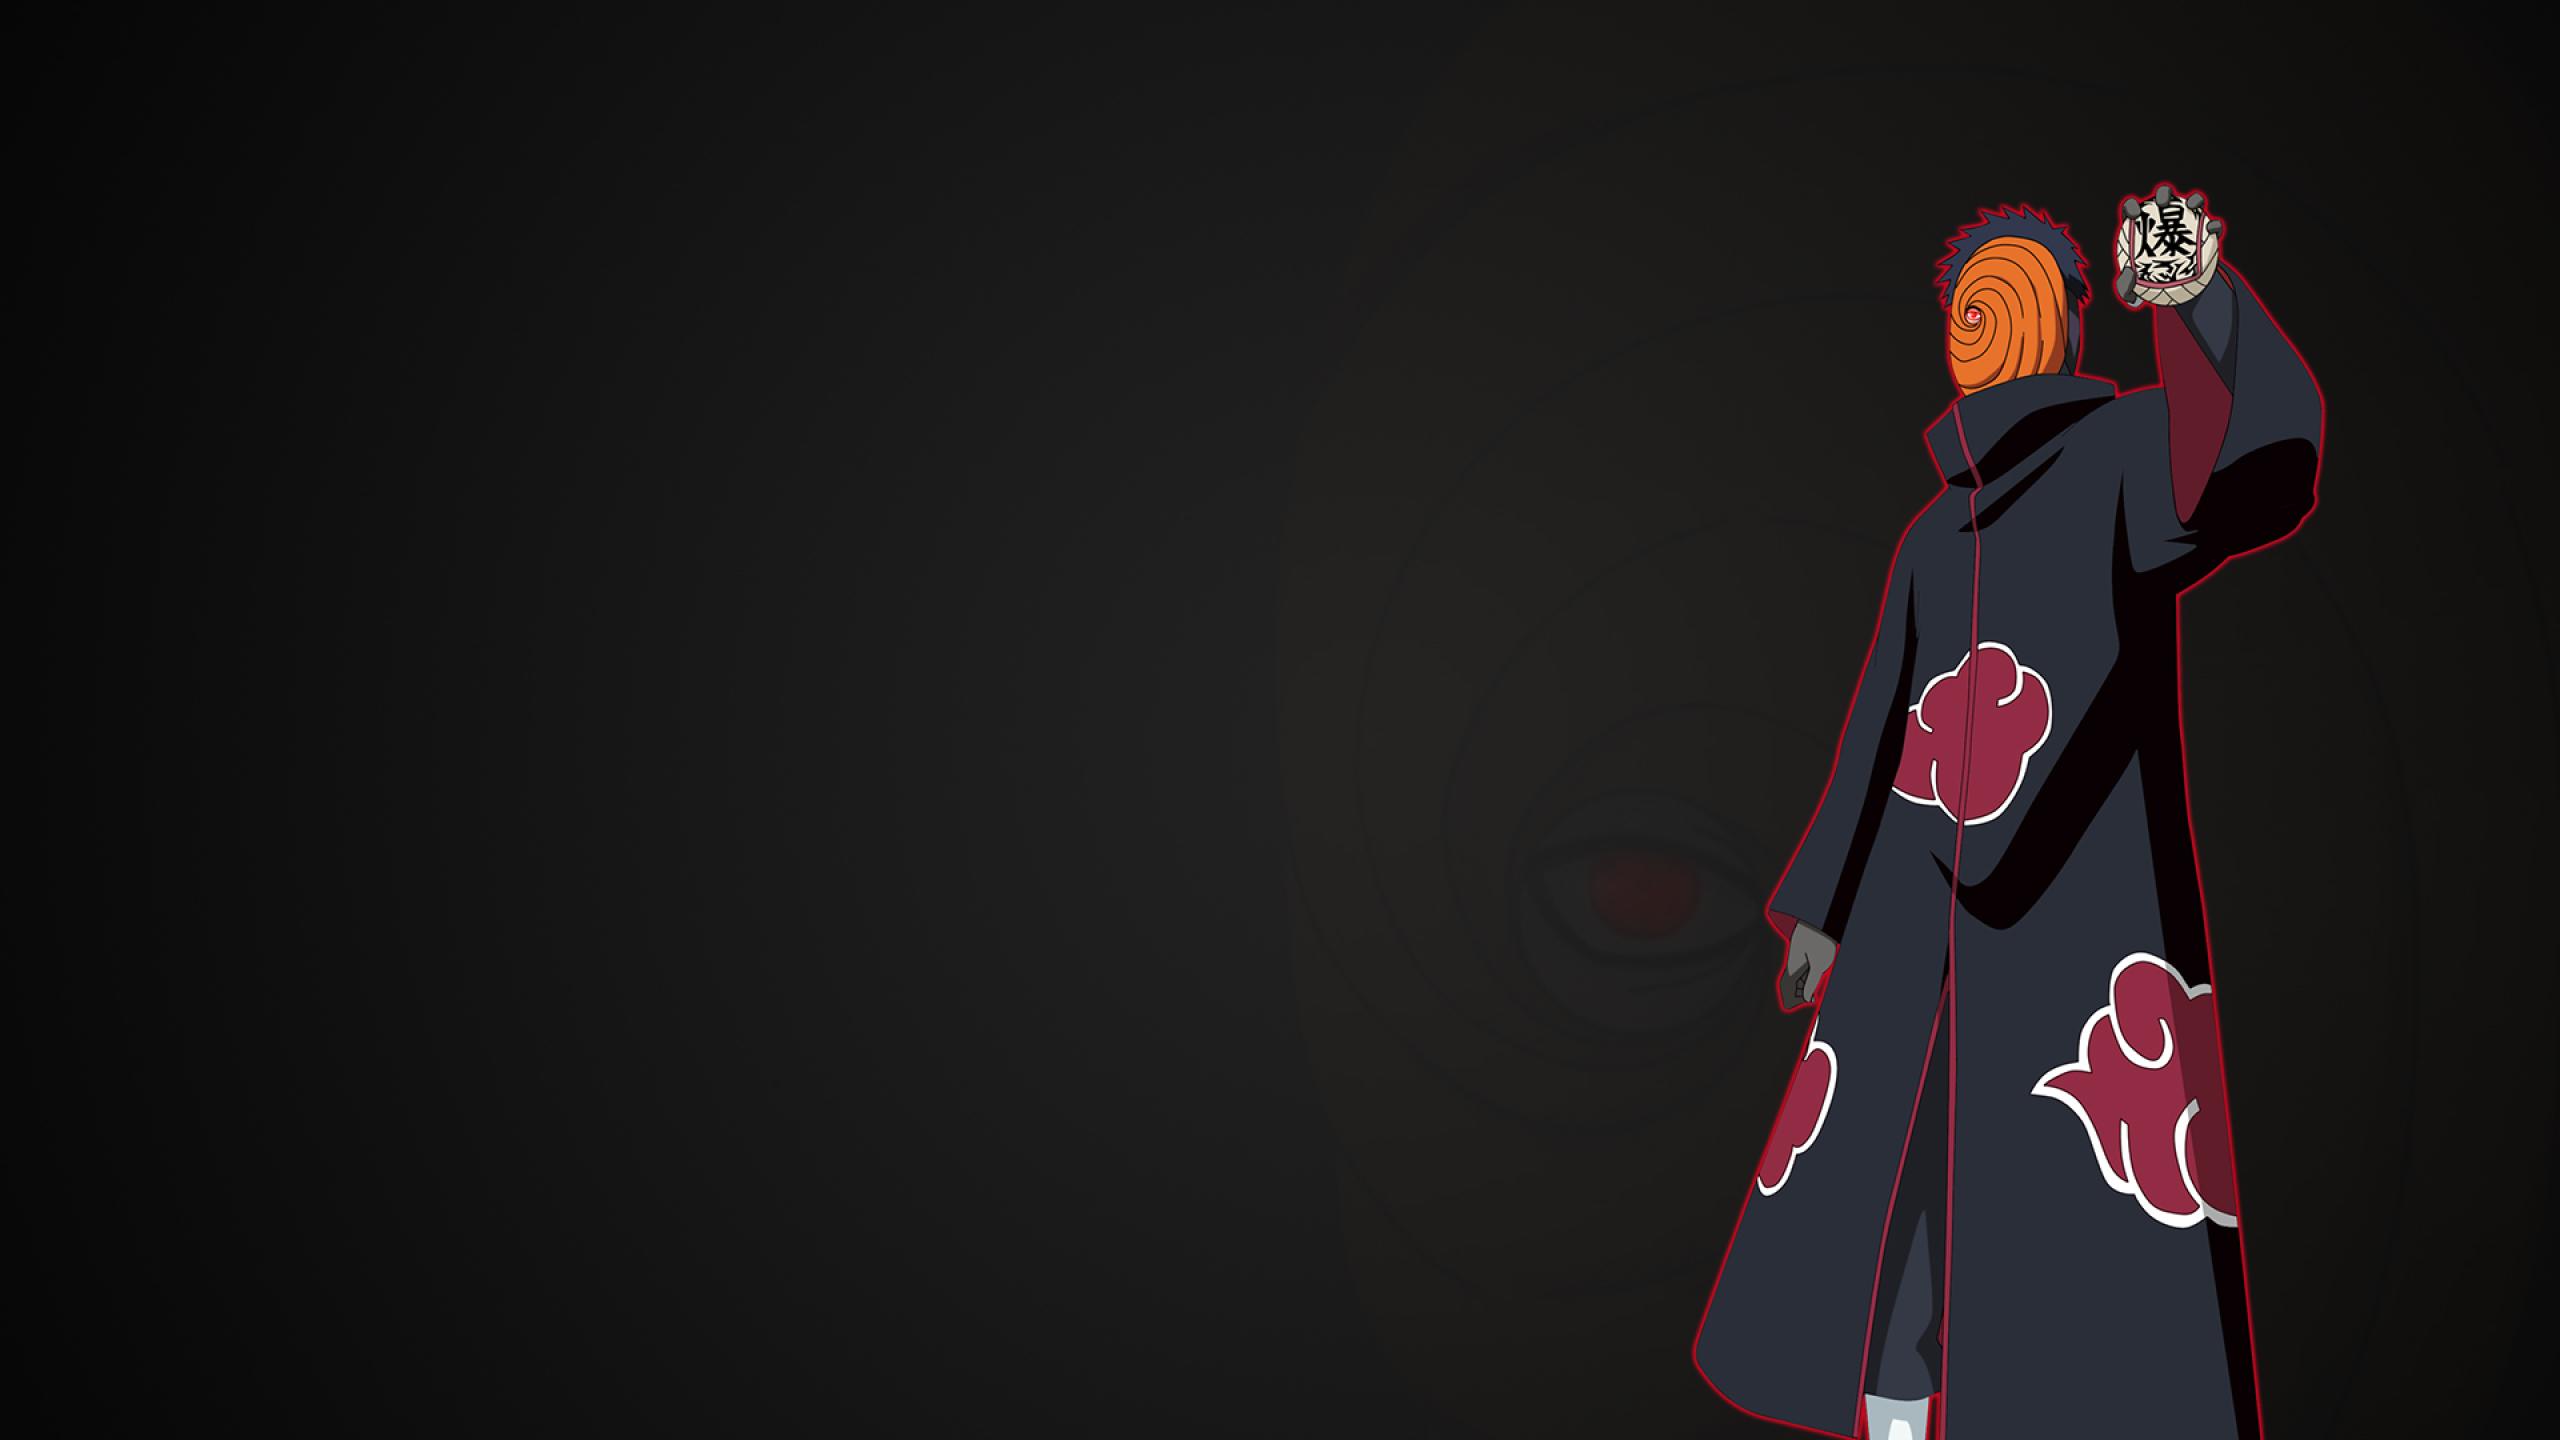 2560x1440 Naruto Shippuuden Anime 1440P Resolution ...